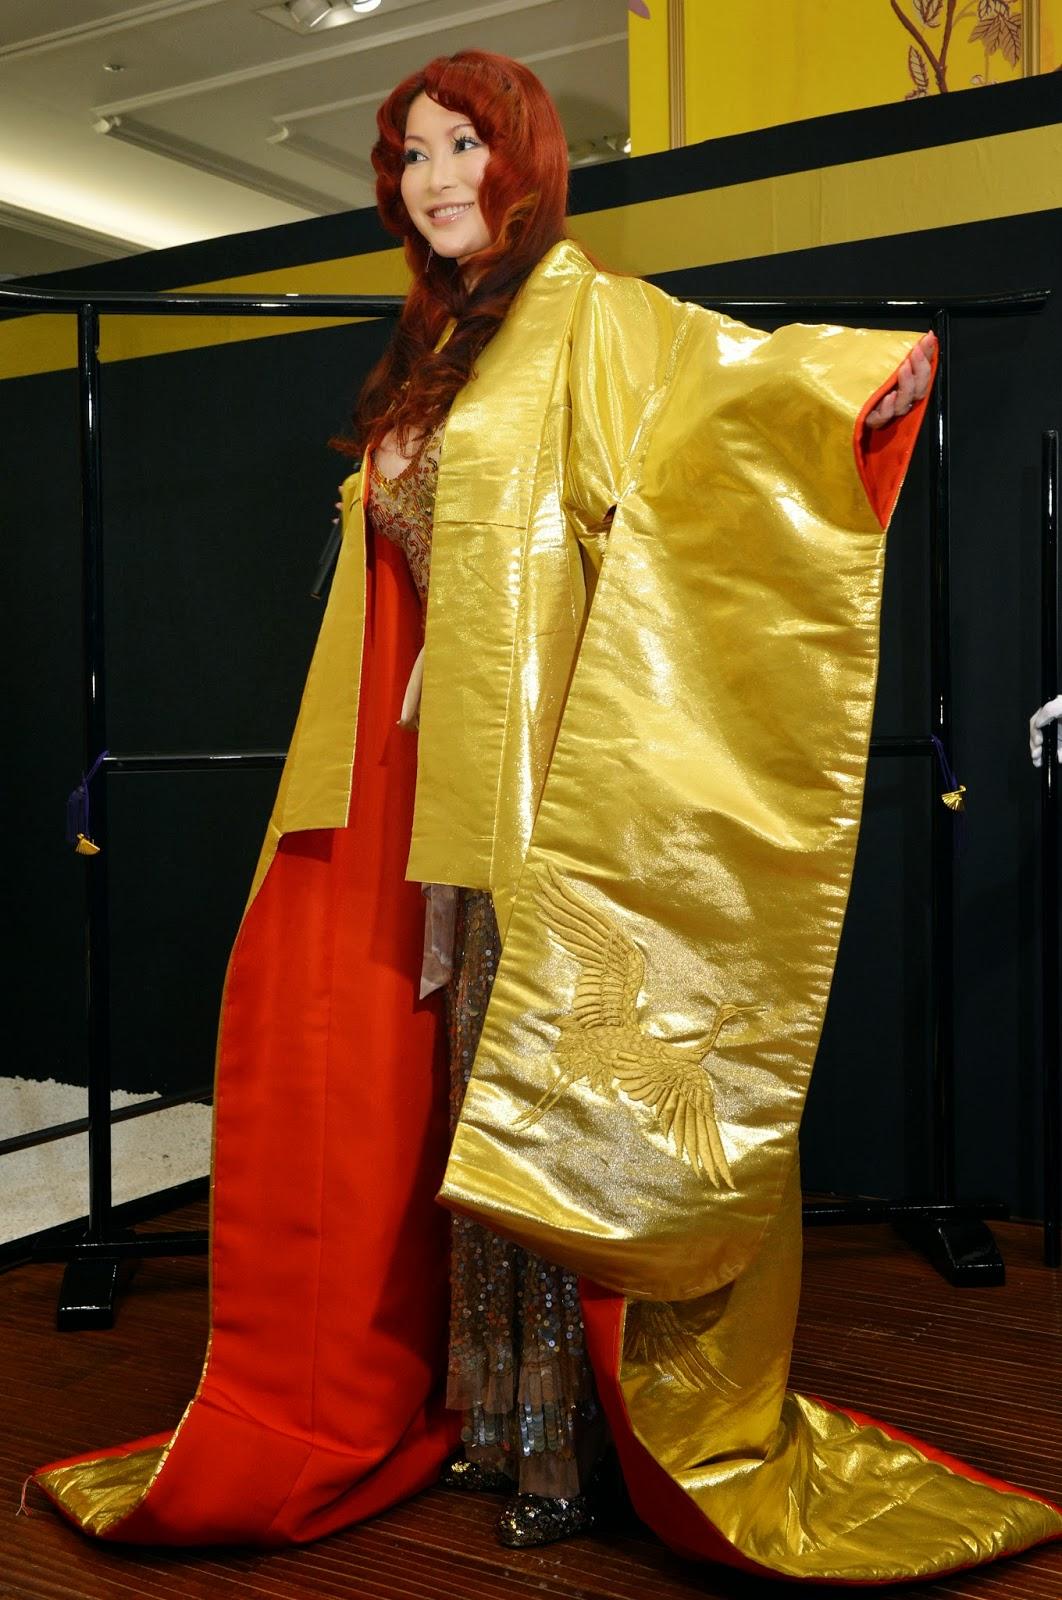 Bridal robe, Business, Chocolate, Economy, Exhibition, Gold, Gold Expo, Gold made products, Hello Kitty doll, Japan, Mika Kano, Million Yen, Panda, Pure Gold, Tokyo, USD, World boxing champion, Yoko Gushiken,